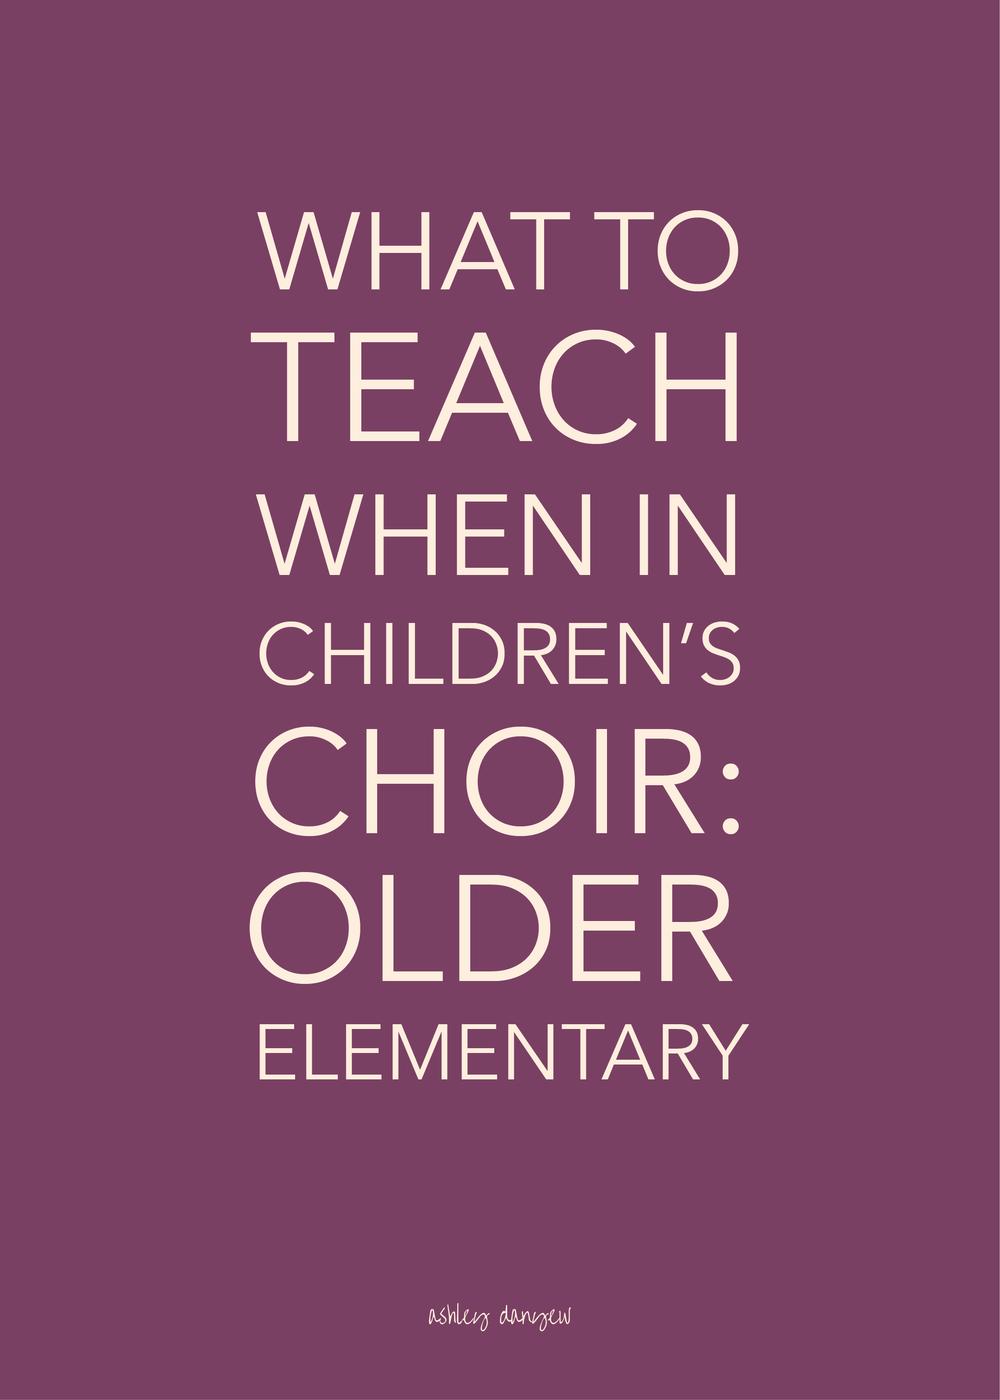 What to Teach When in Children's Choir - Older Elementary-05.png